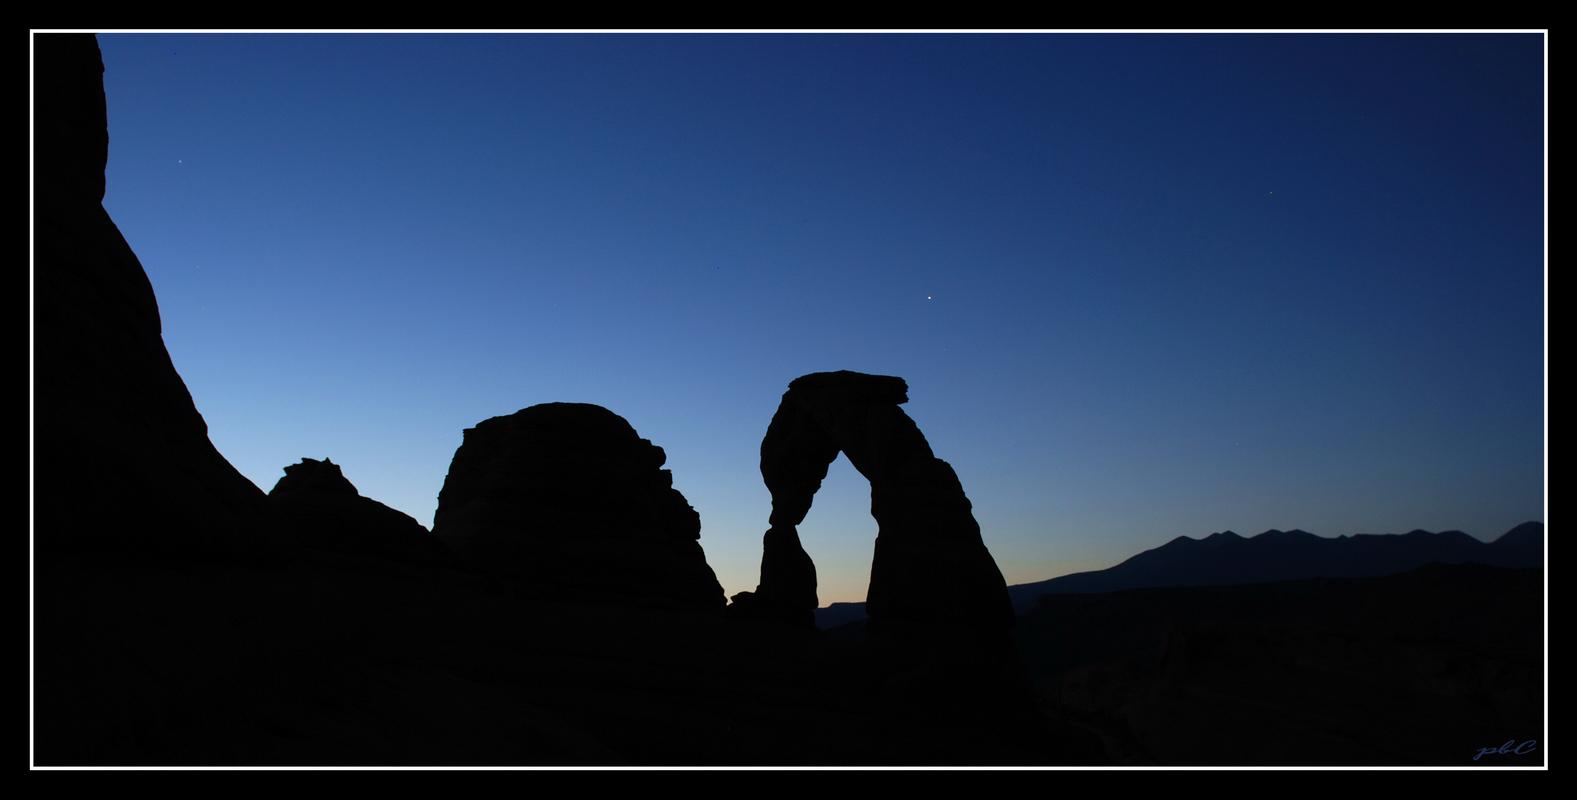 Delikate Arch, Moab Utah